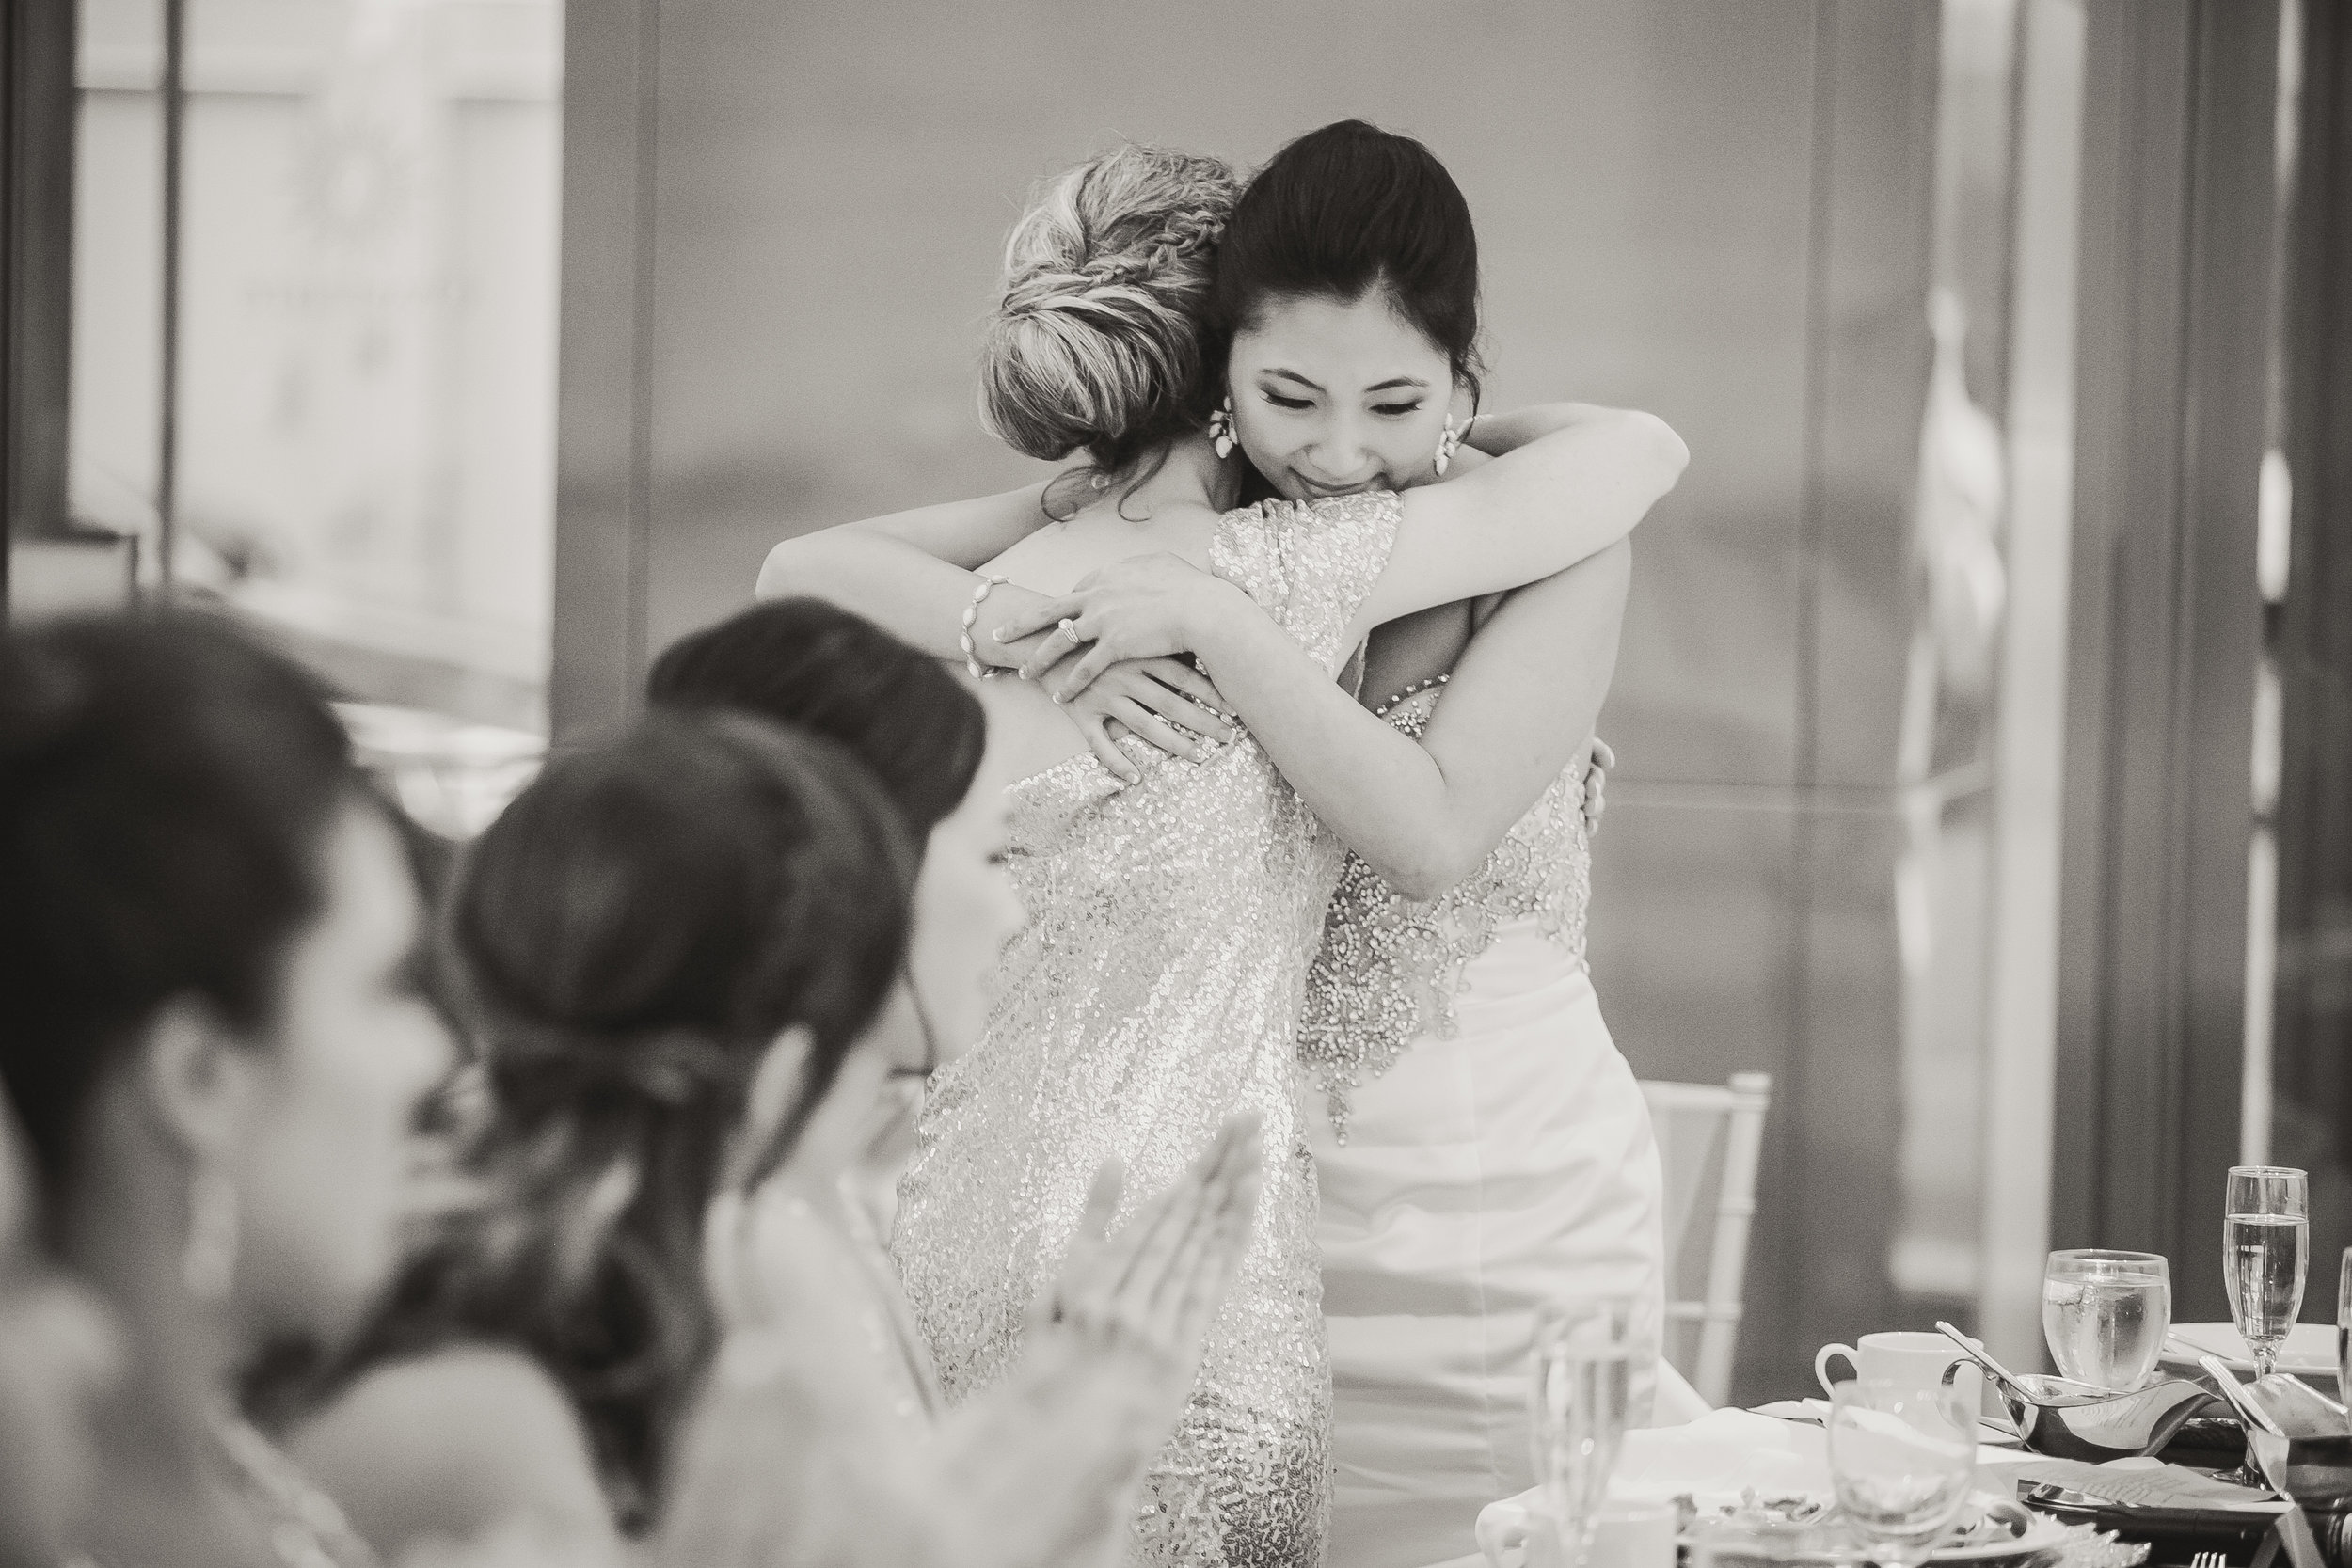 acowsay-cinema-minnesota-wedding-red-gold-blush-29.jpg